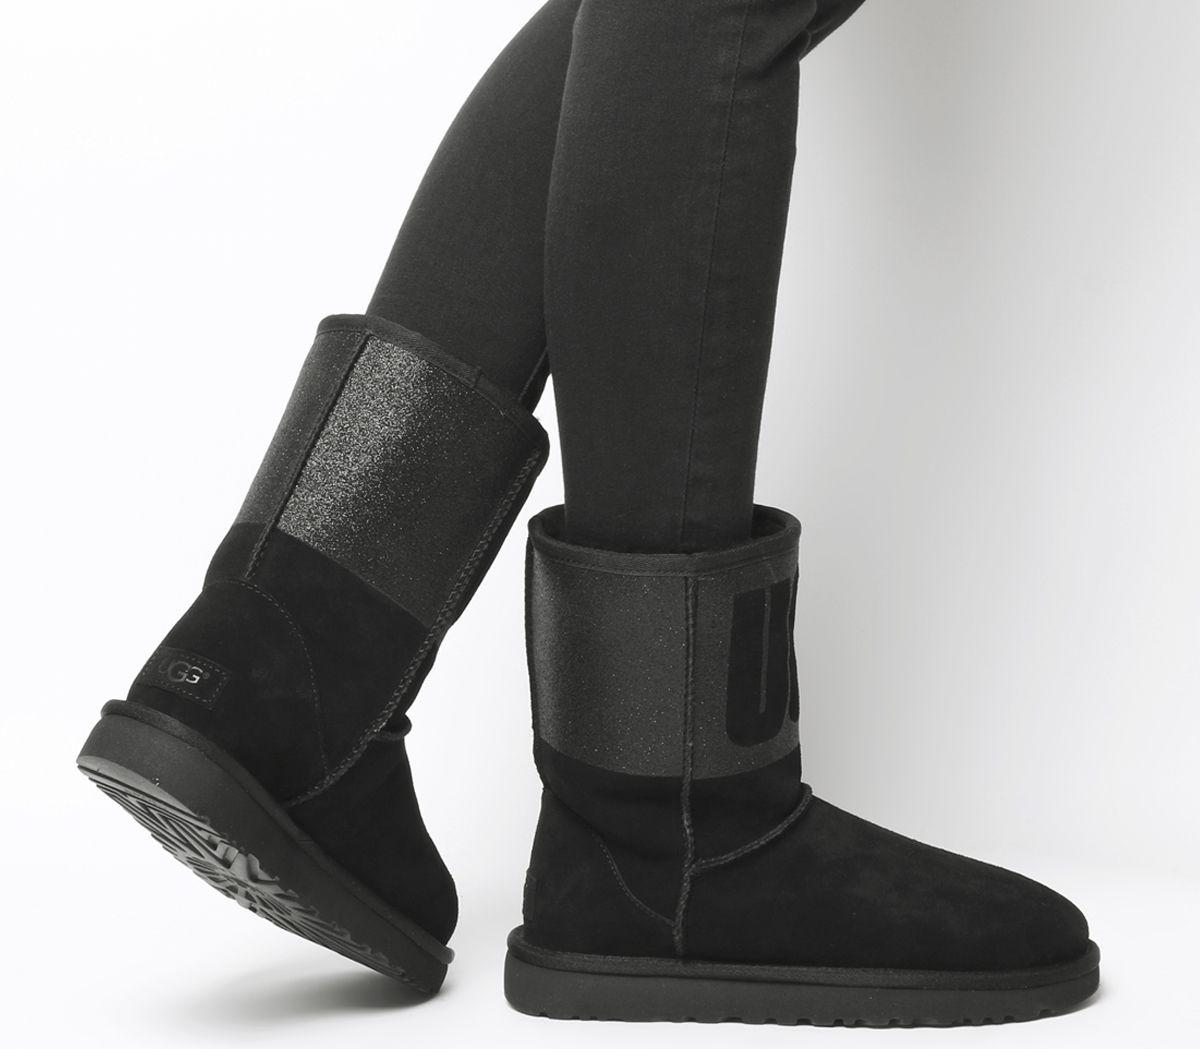 e6f07627c3f Classic Short Ugg Rubber Boots